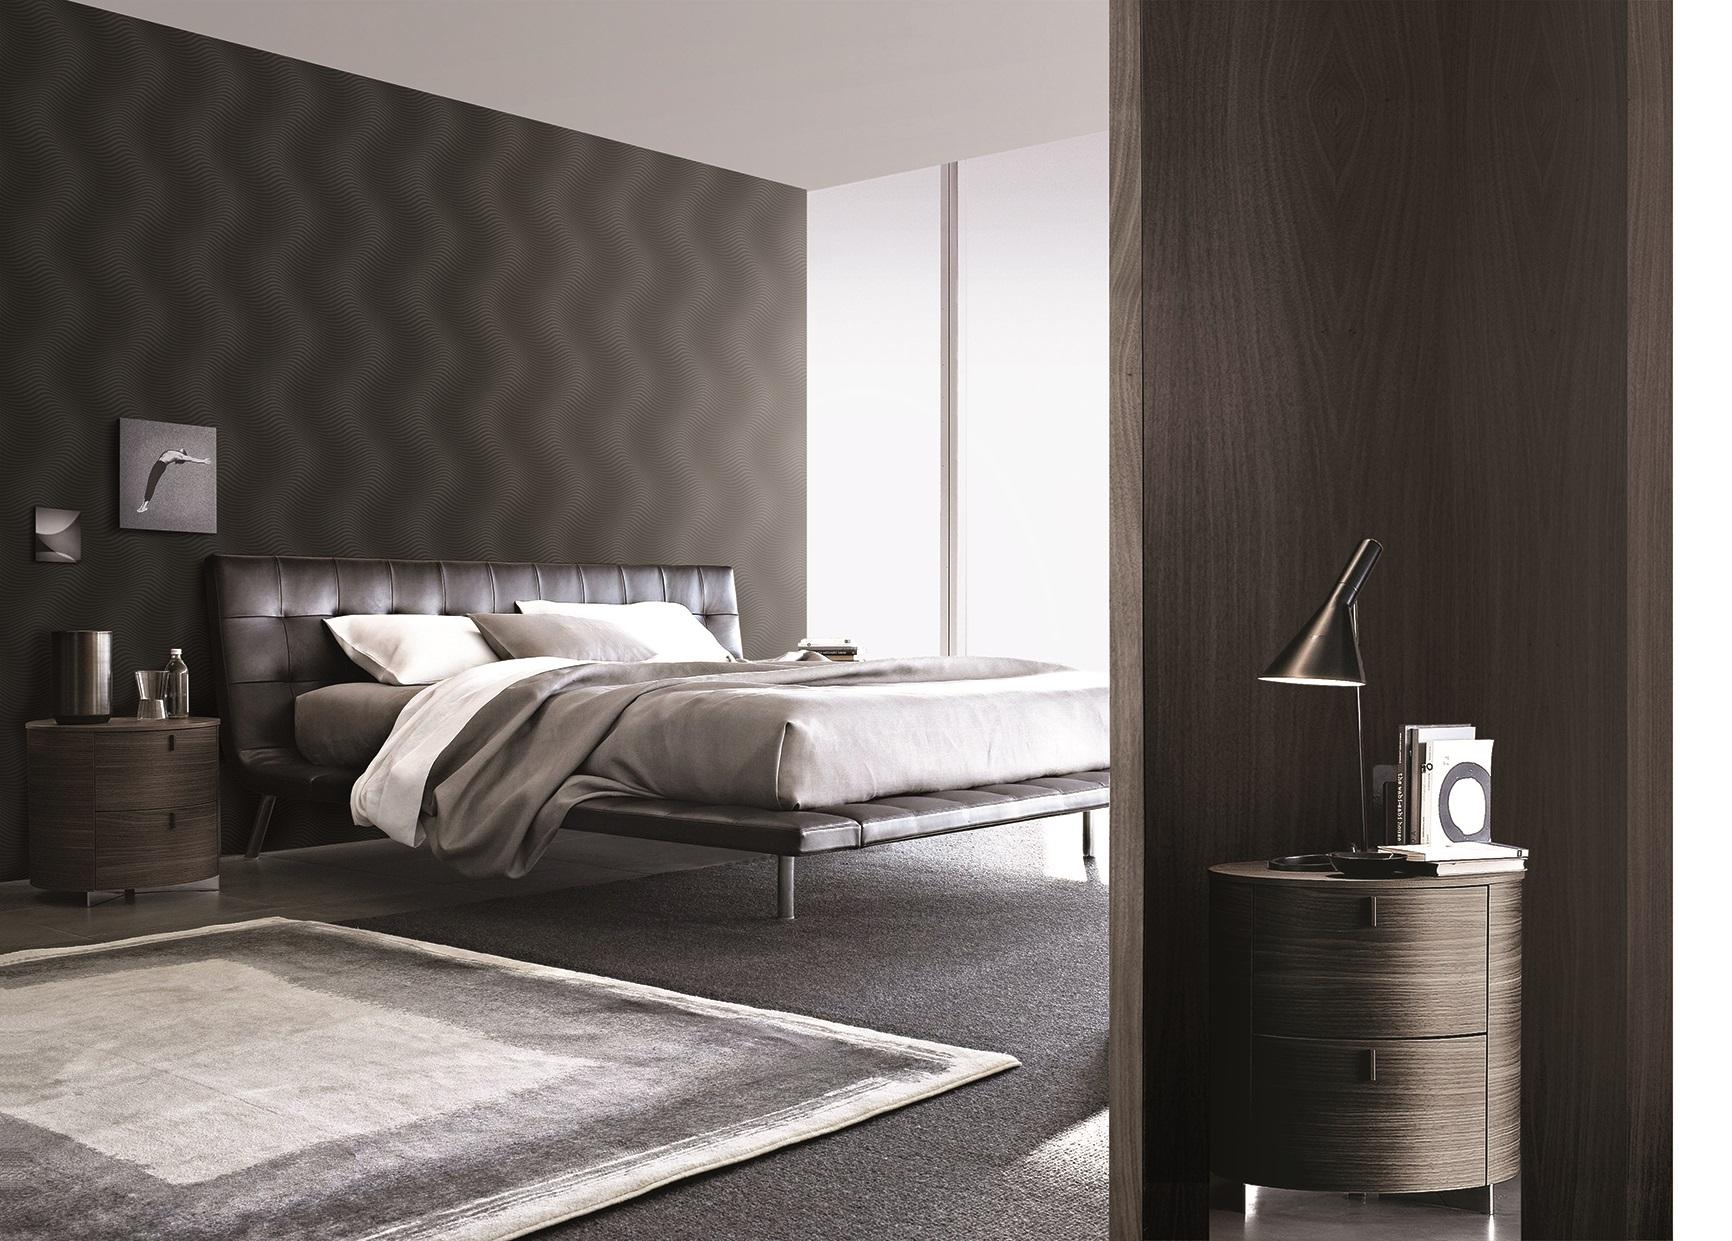 retro tapeten g nstig online kaufen joratrend tapetenshop. Black Bedroom Furniture Sets. Home Design Ideas